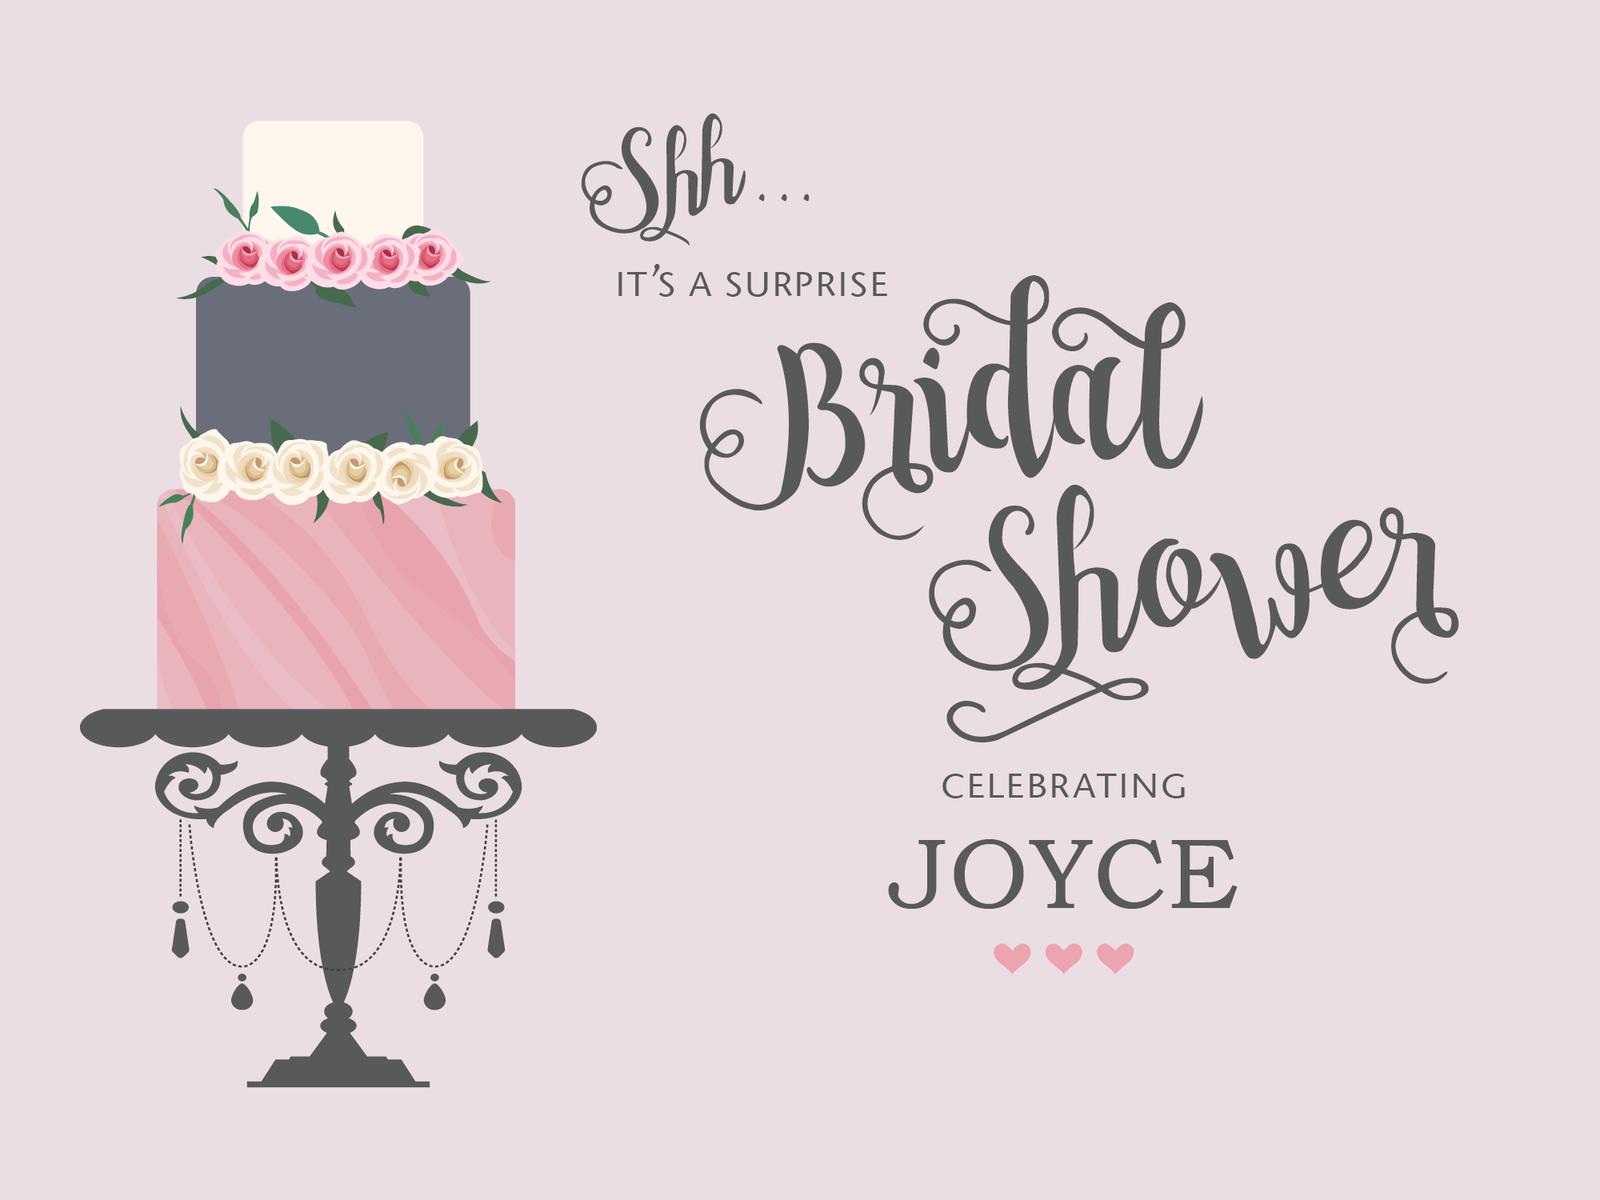 Bridal Shower Invite by Zenia Tsui-Ng - Dribbble